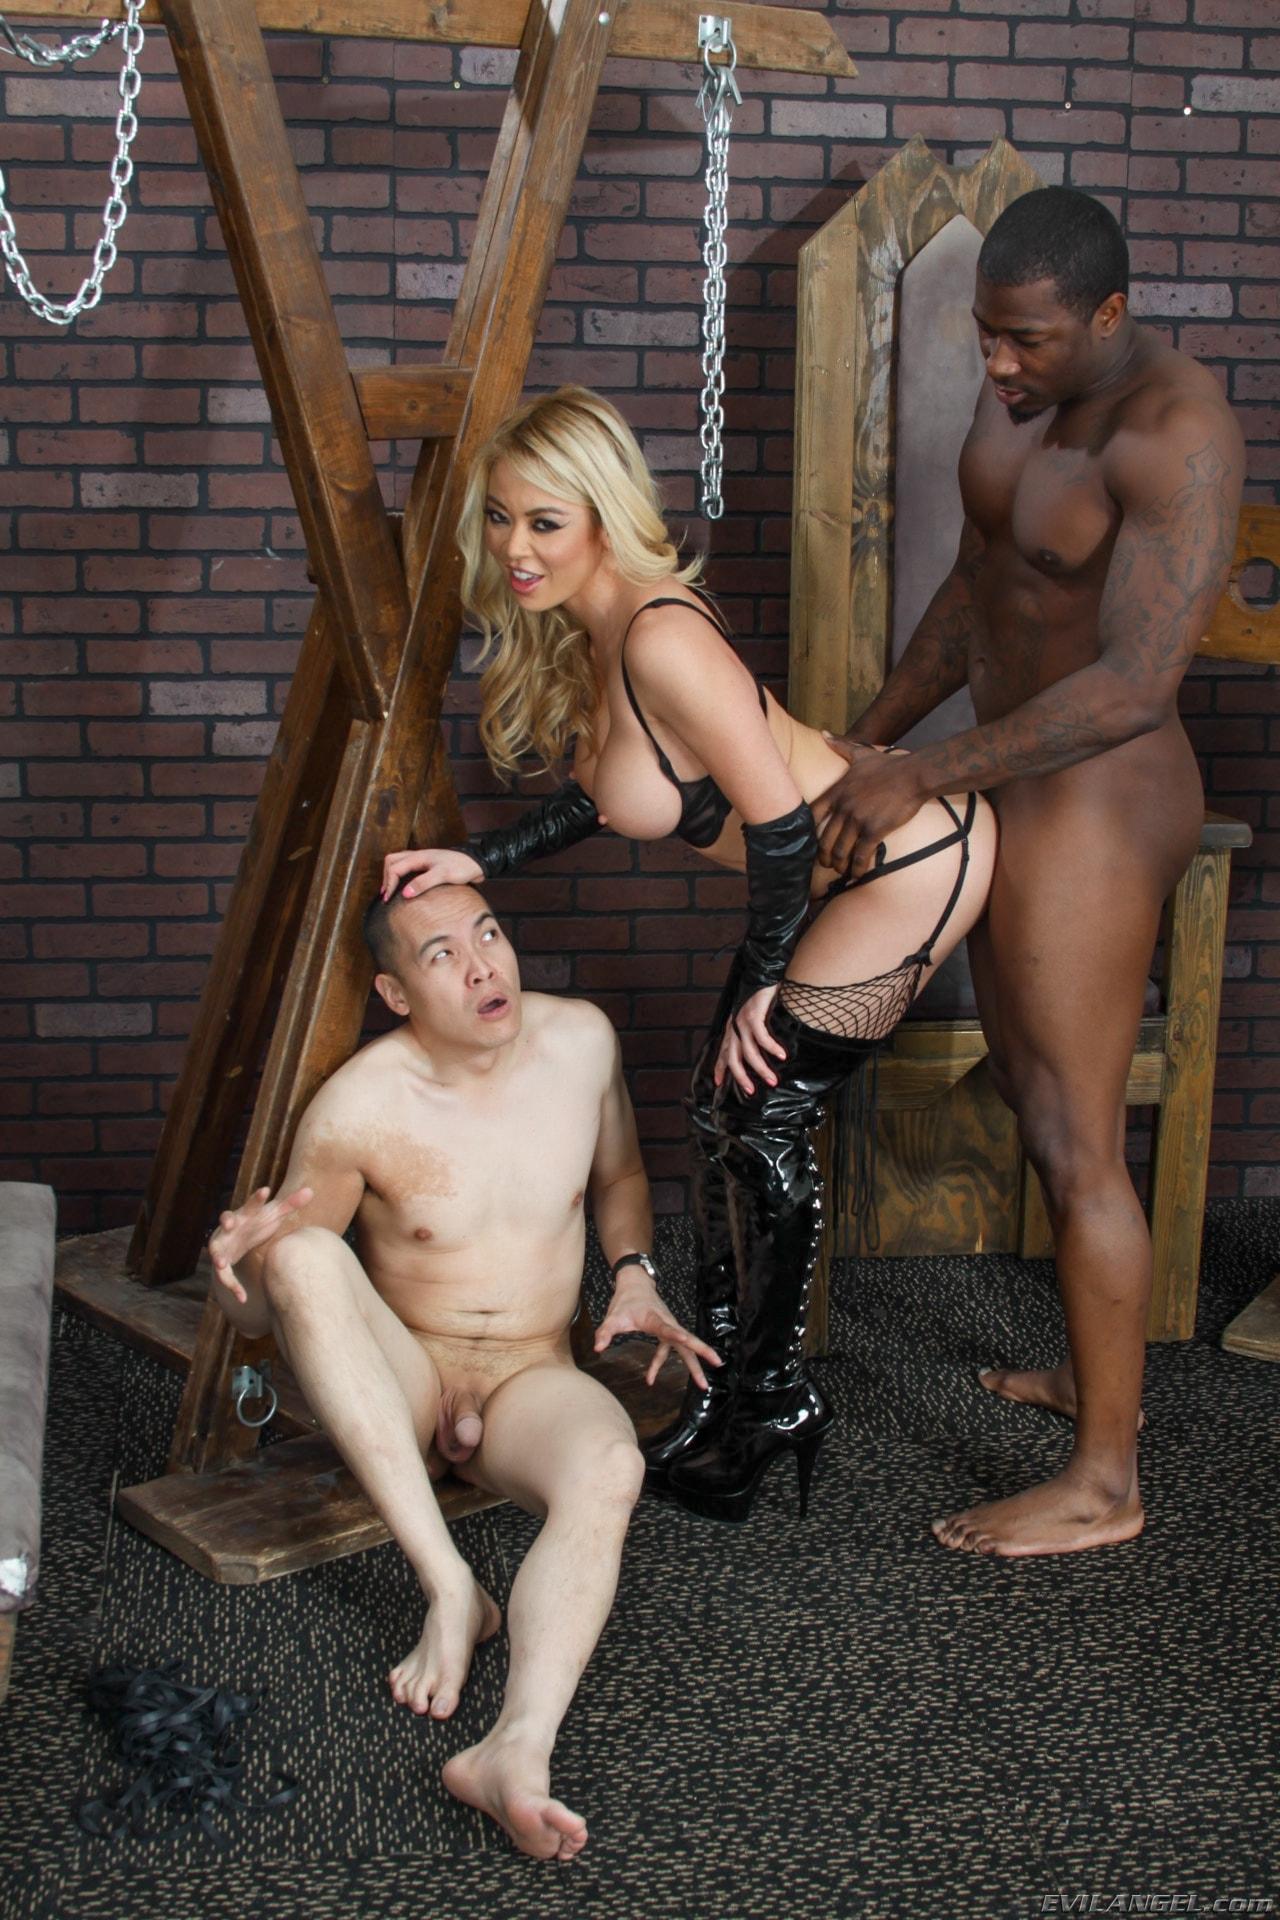 Free femdom cuckold strapon interracial porn — photo 15